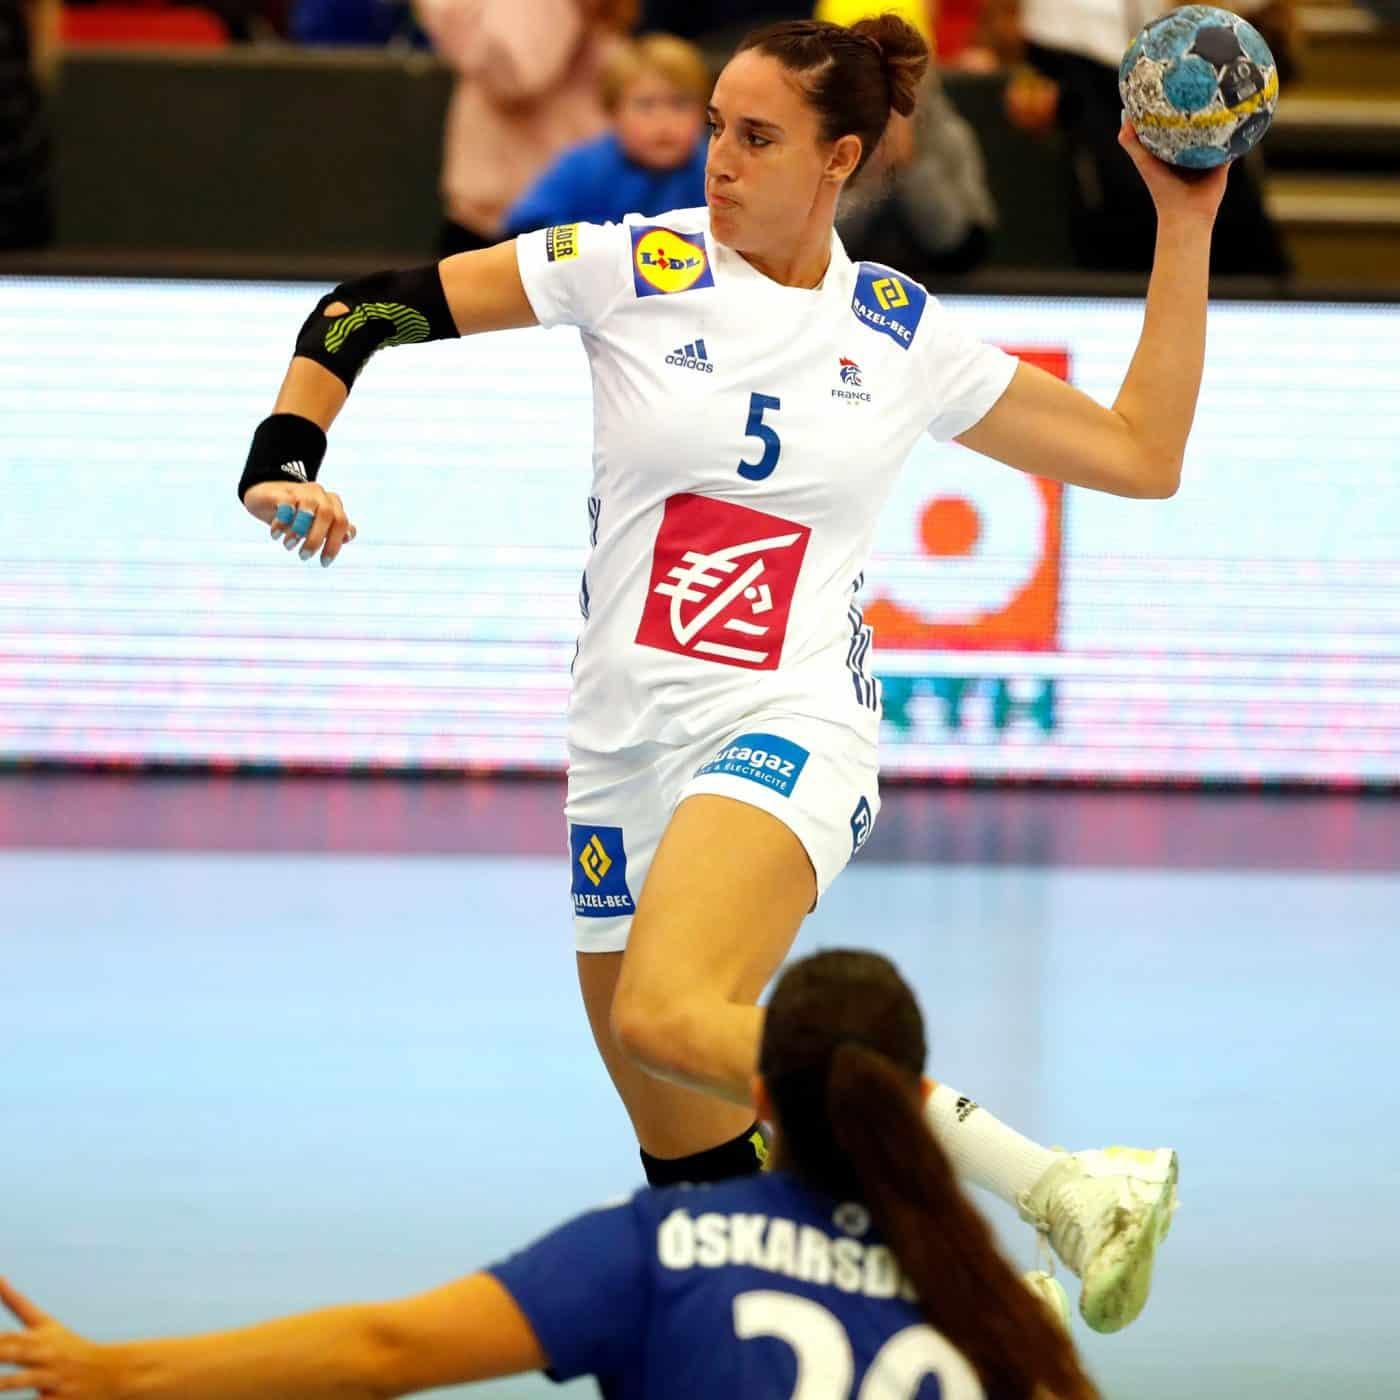 octobre-rose-équipe-de-france-handball-2019-caisse-d-epargne-2